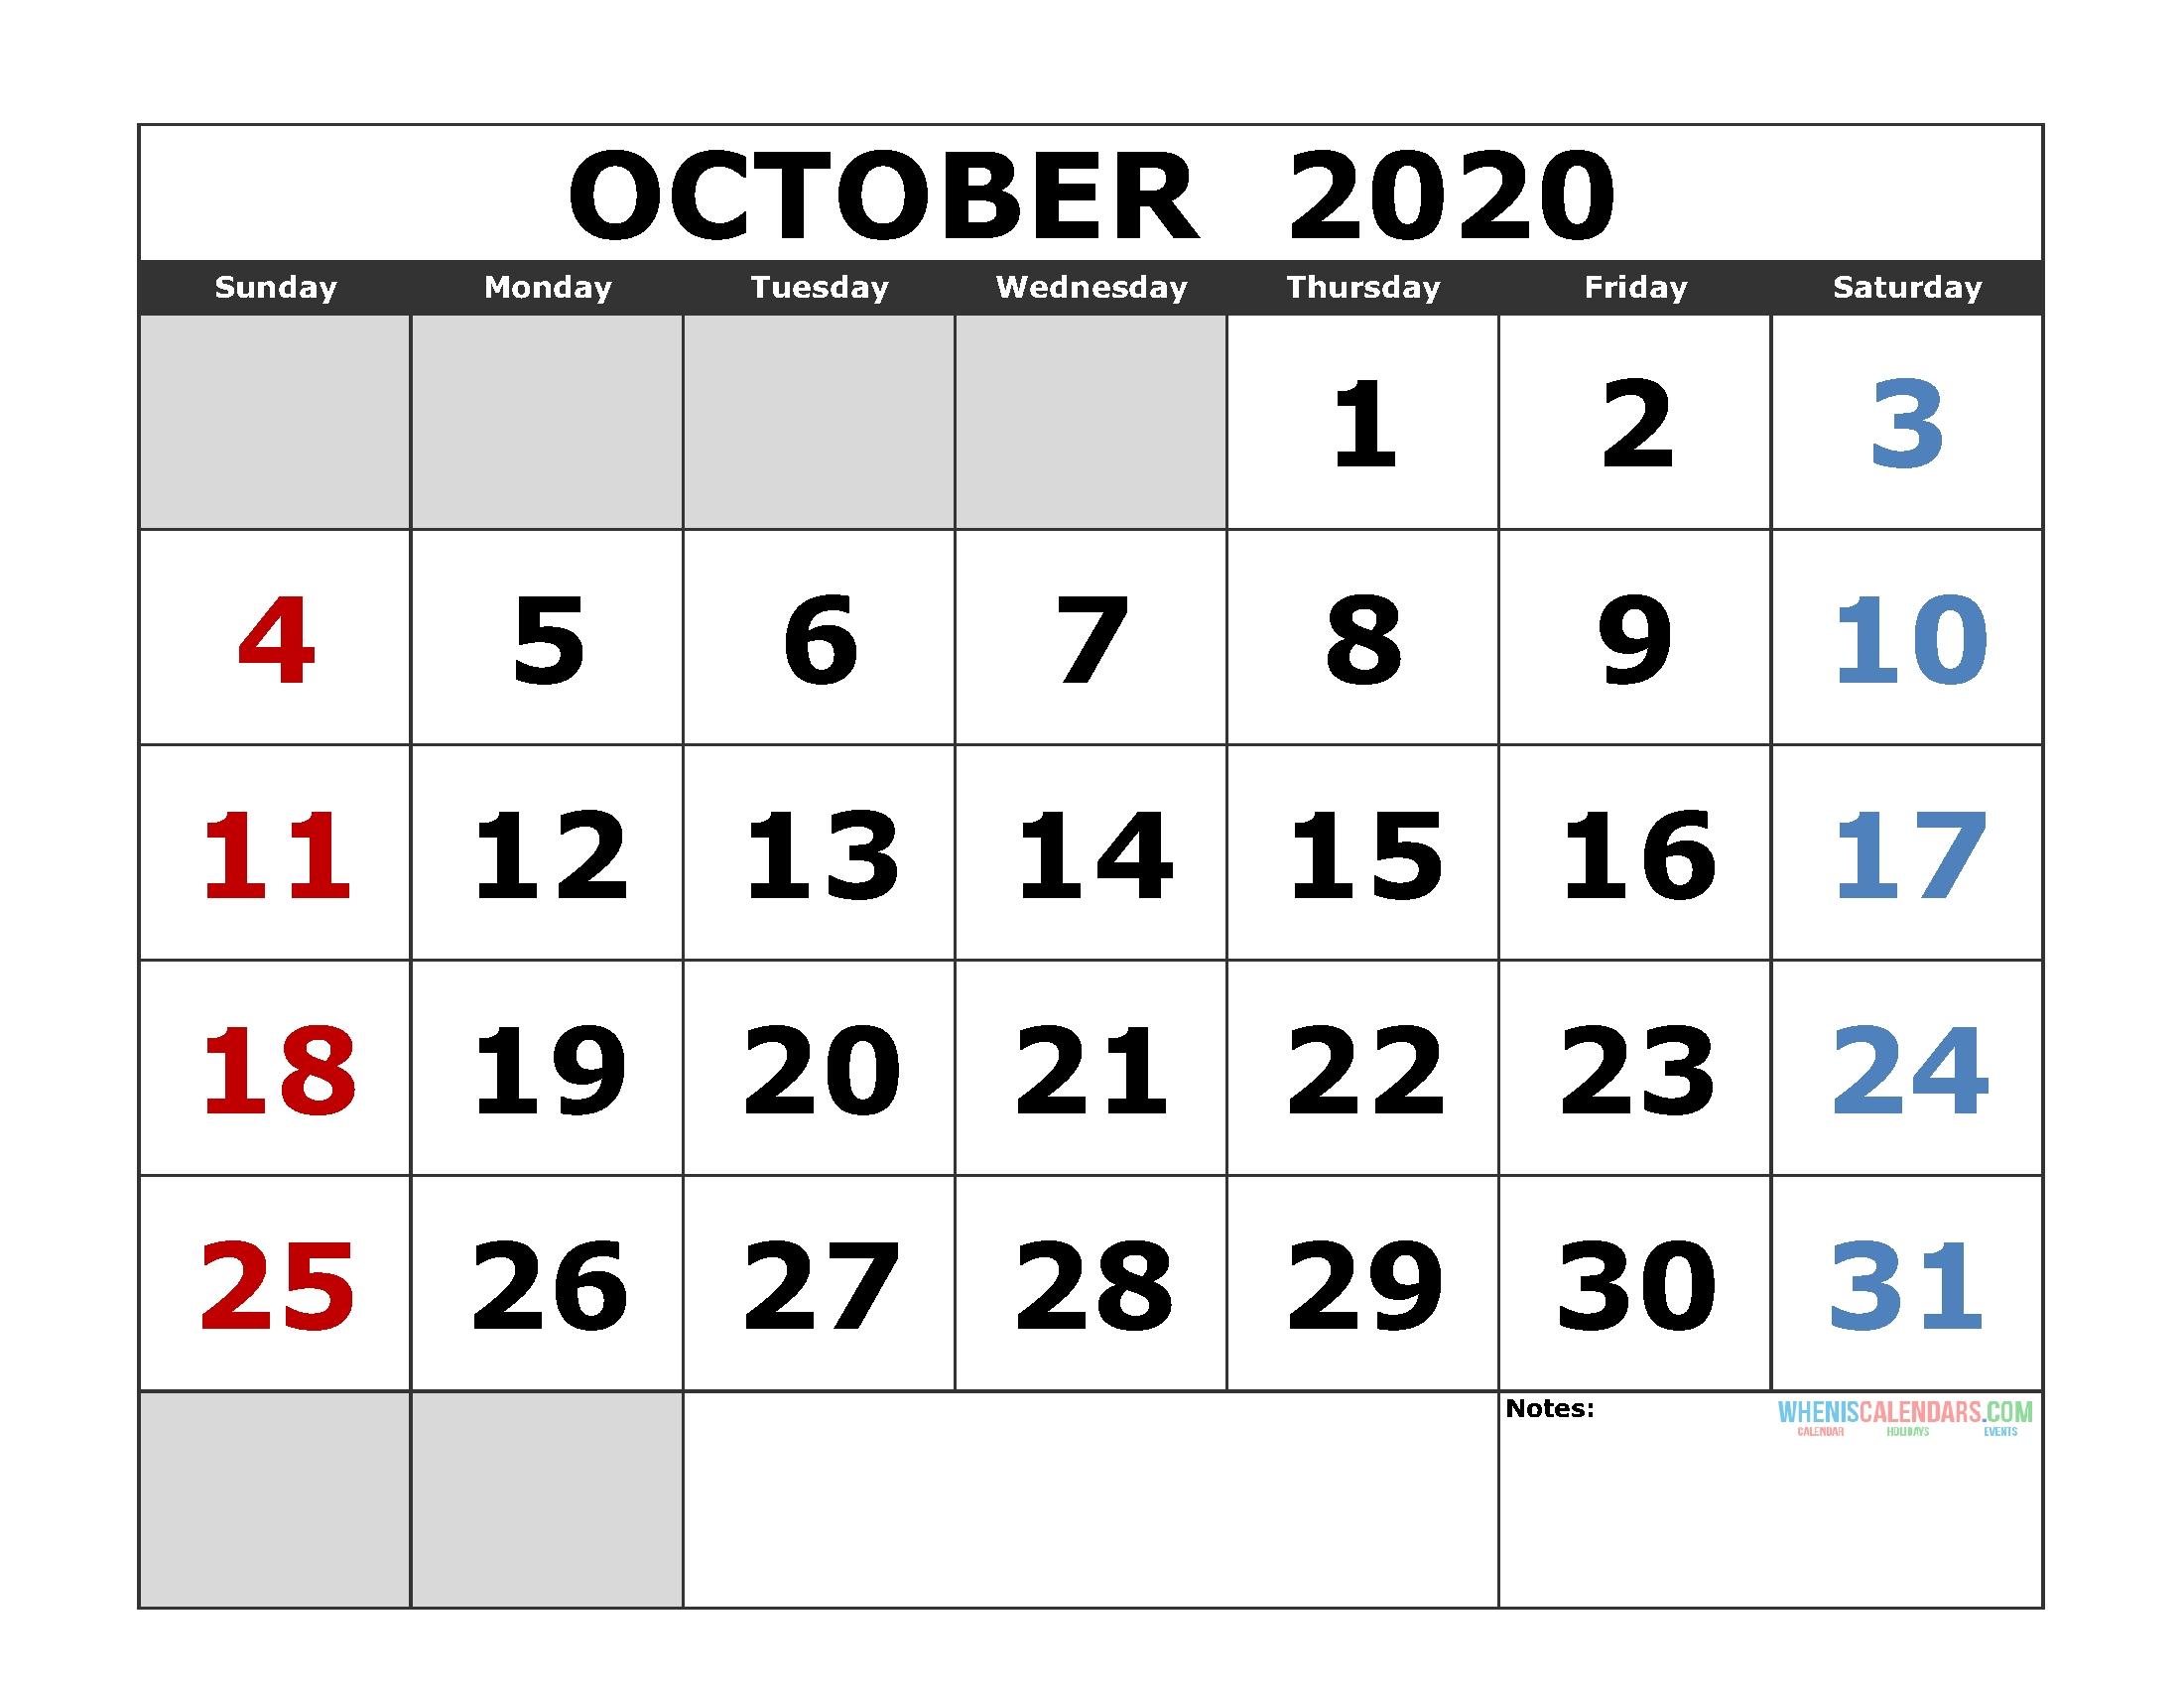 October 2020 Printable Calendar Template Excel, Pdf, Image [Us_Blank Calendar October 2020 Pdf